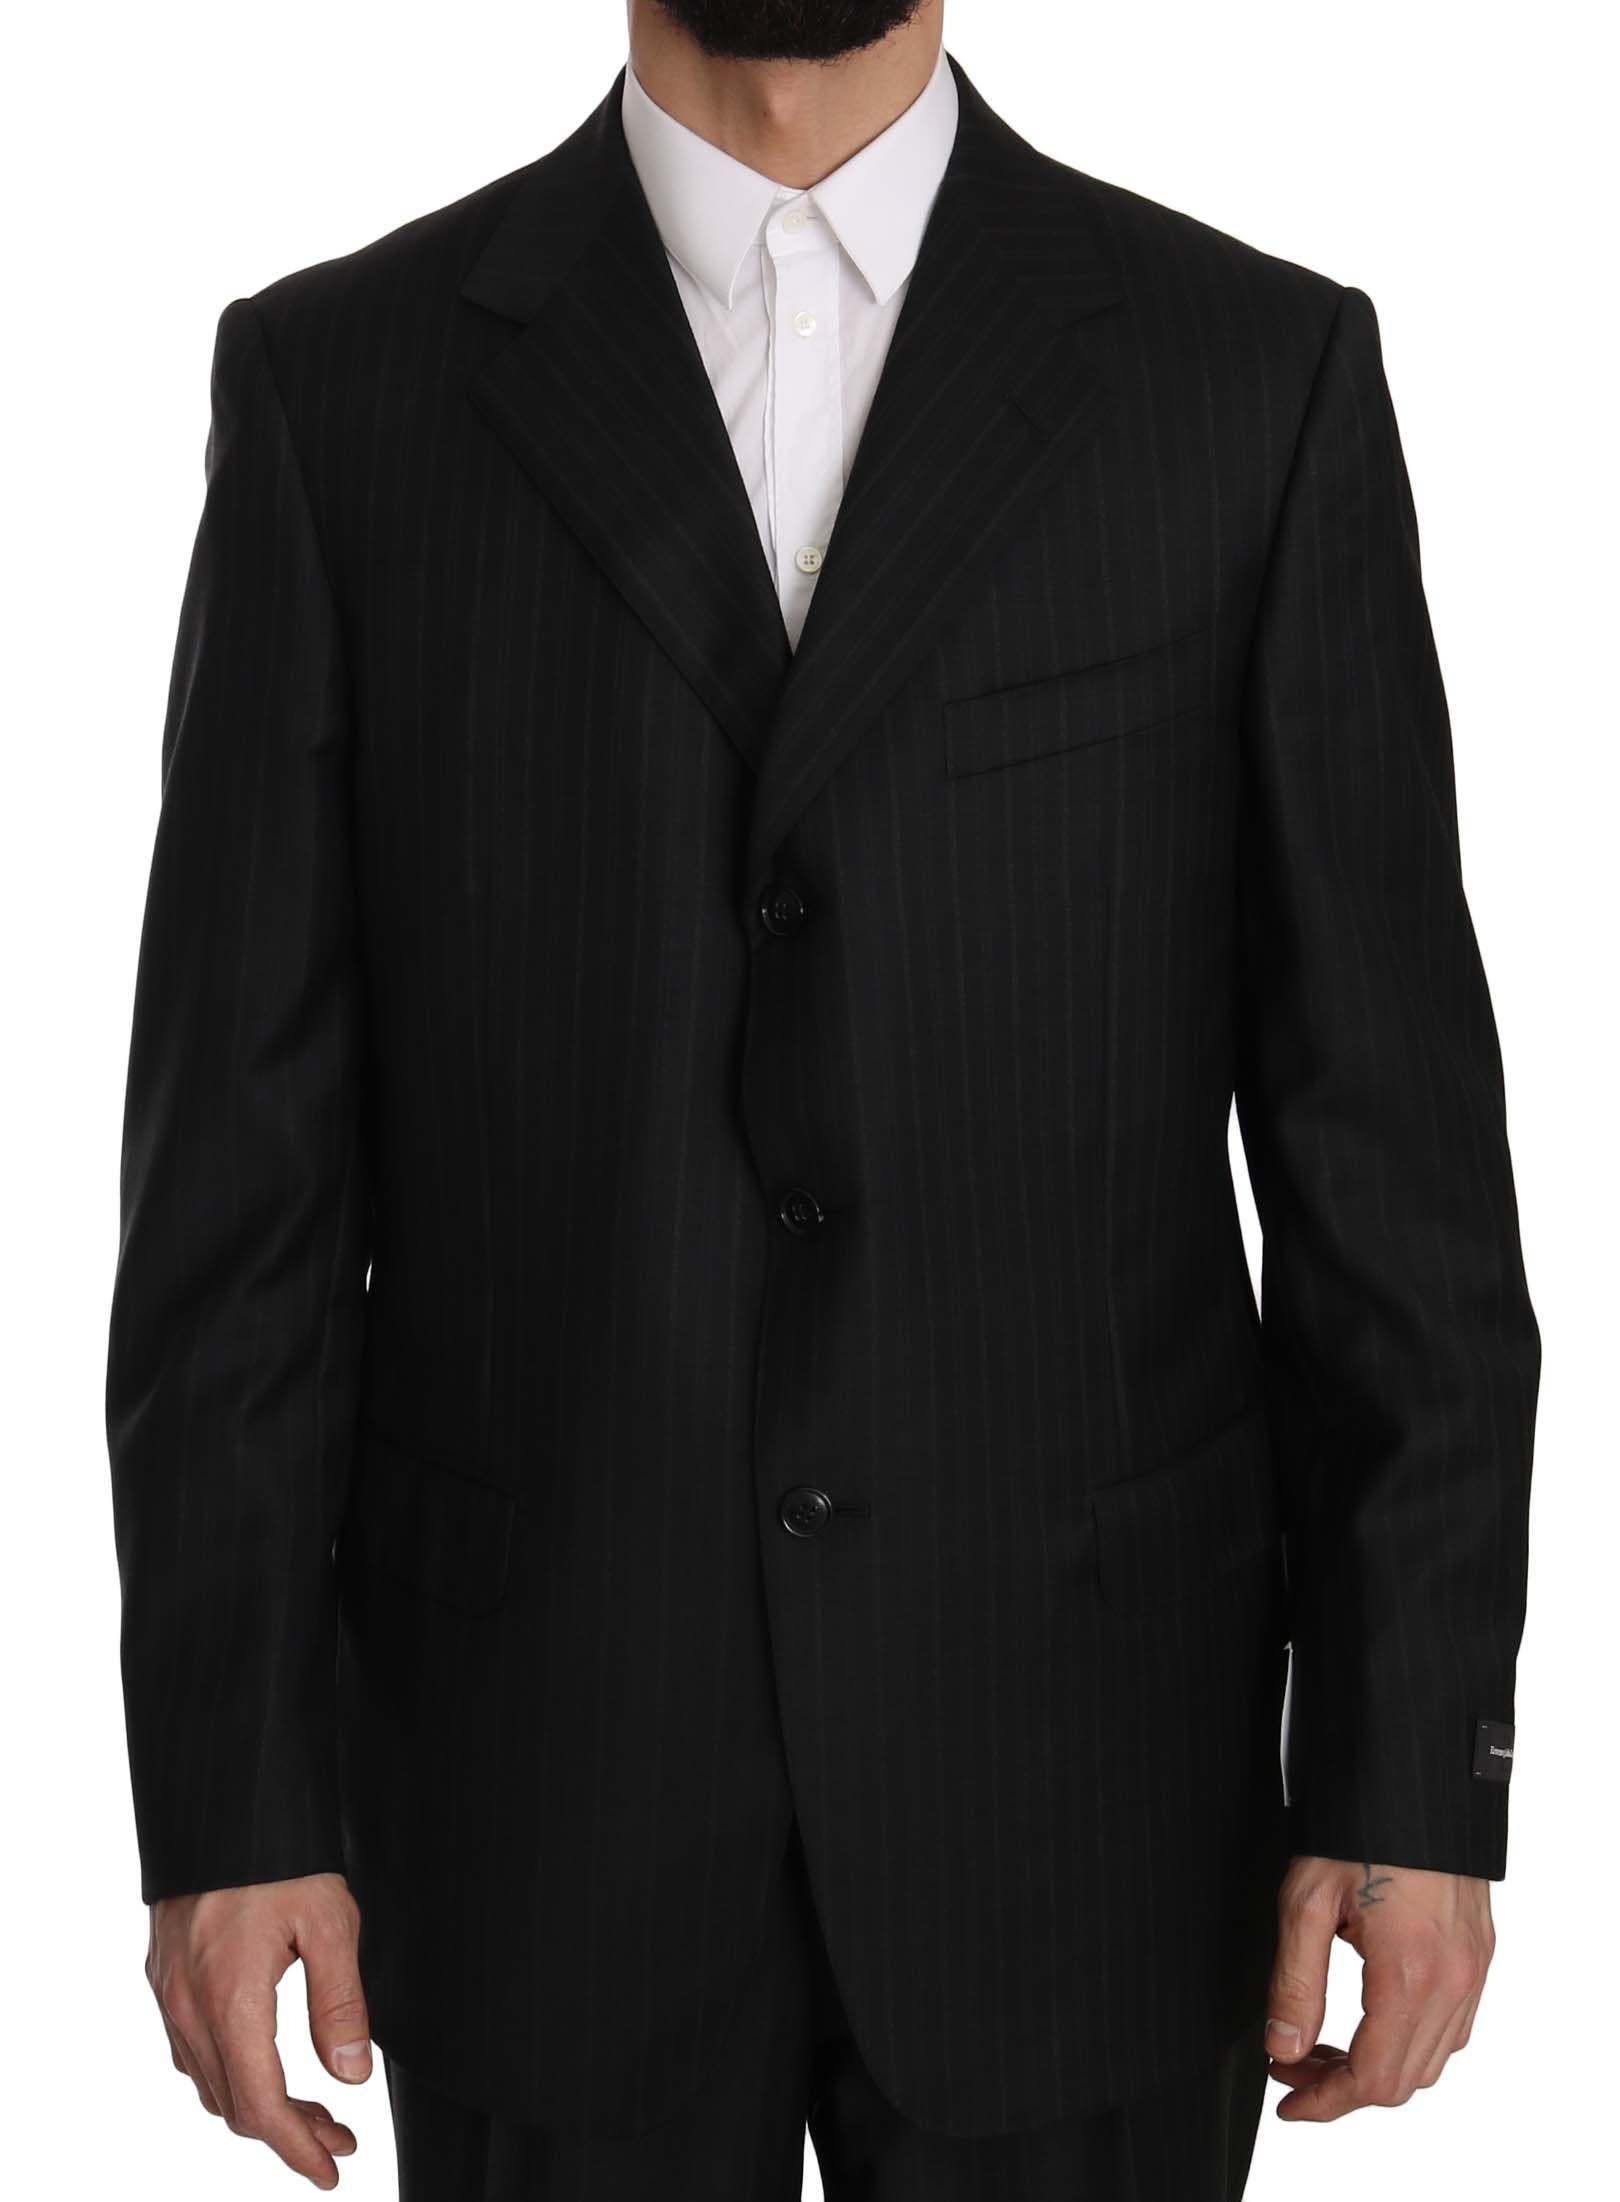 Ermenegildo Zegna Gray Striped  2 Piece 3 Button Wool Suit